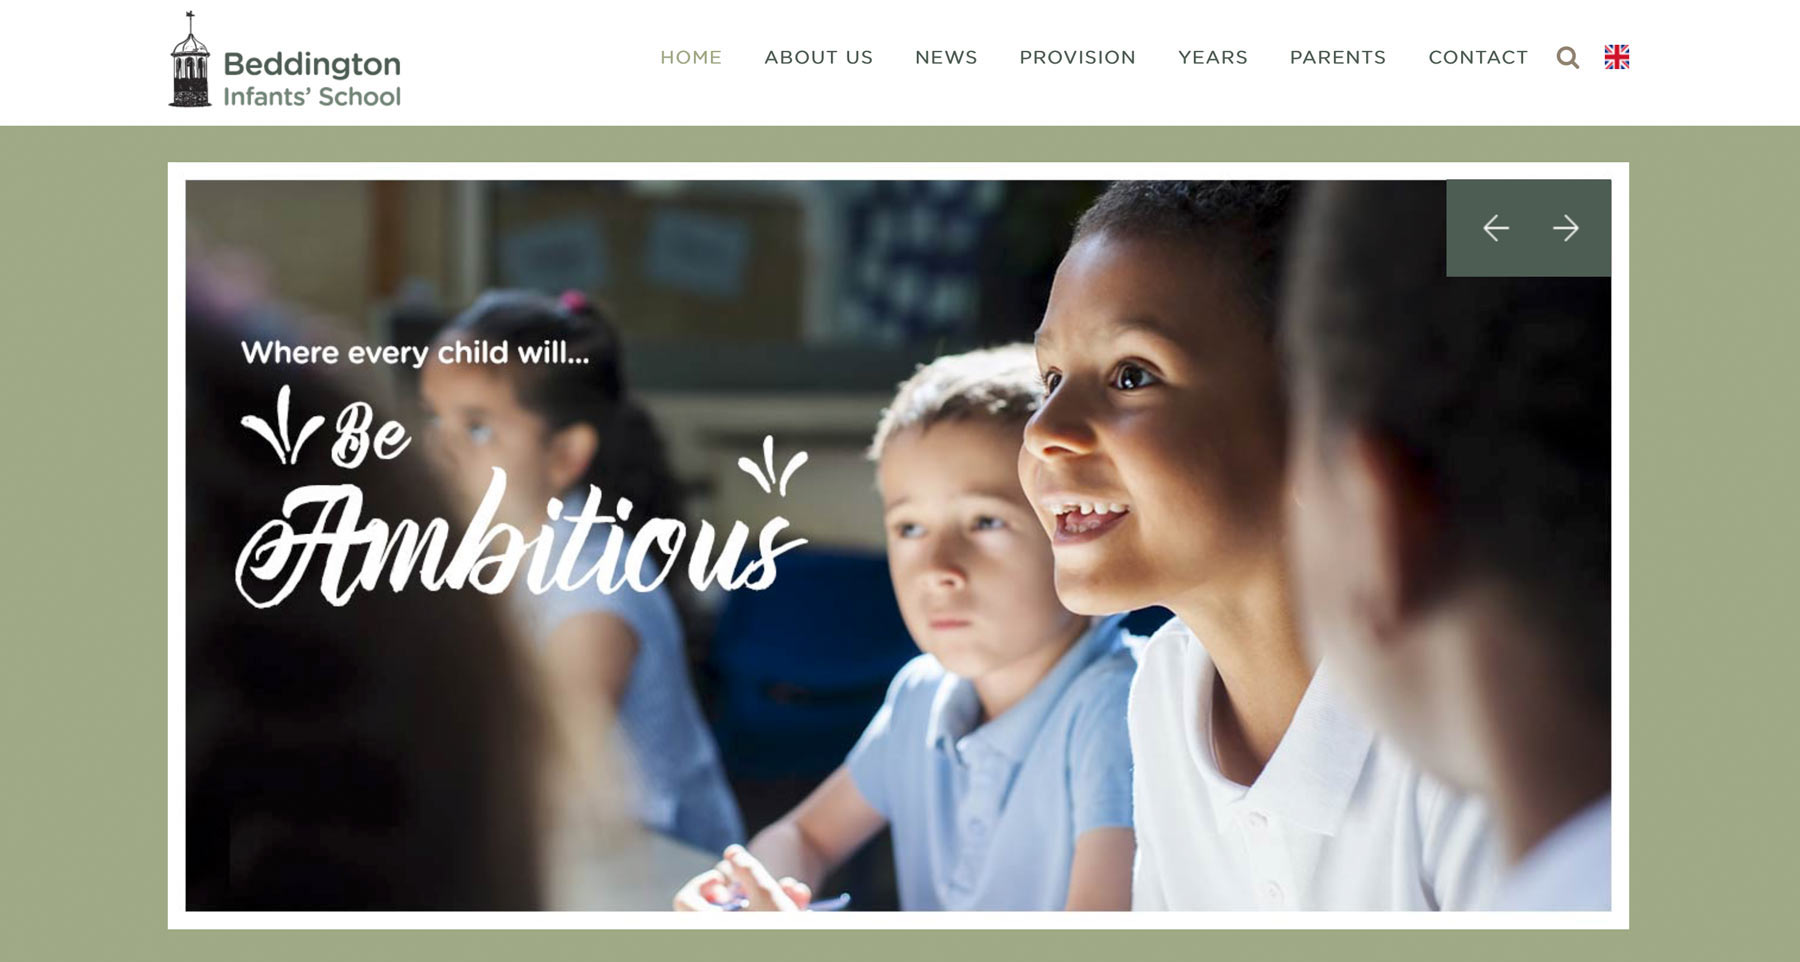 Primary school website photography homepage screenshot